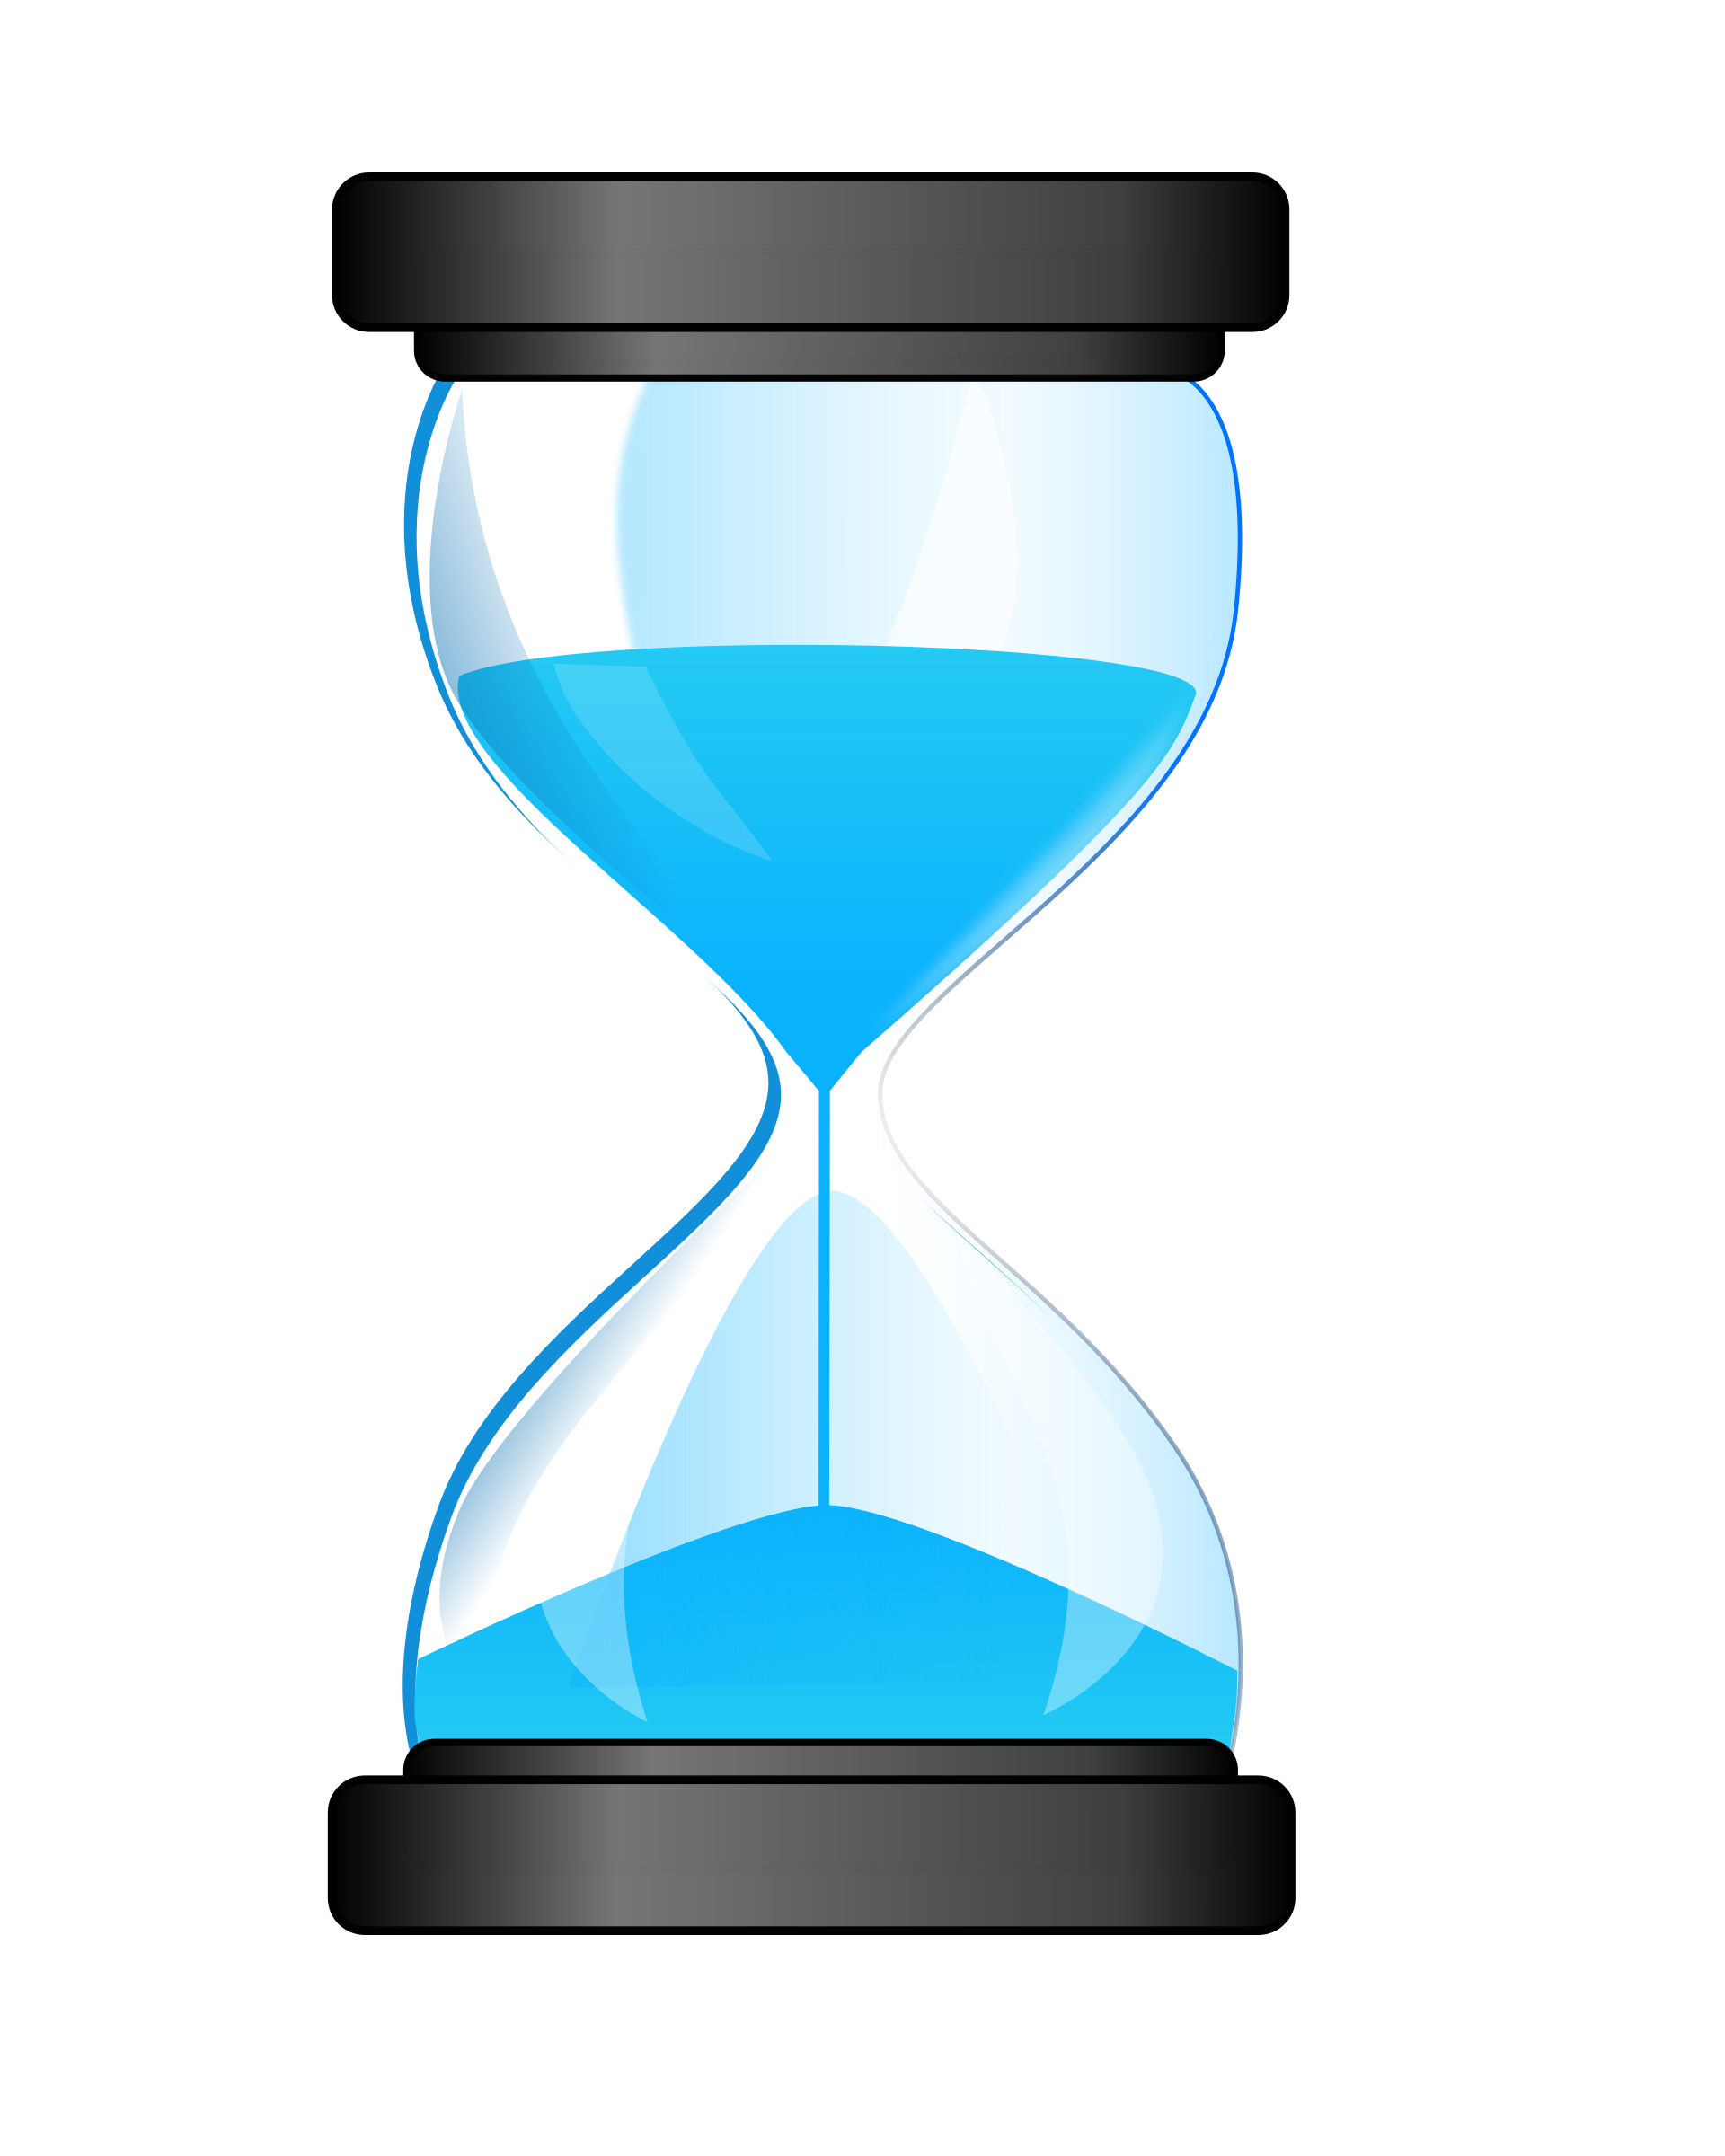 clock by javierkiopo